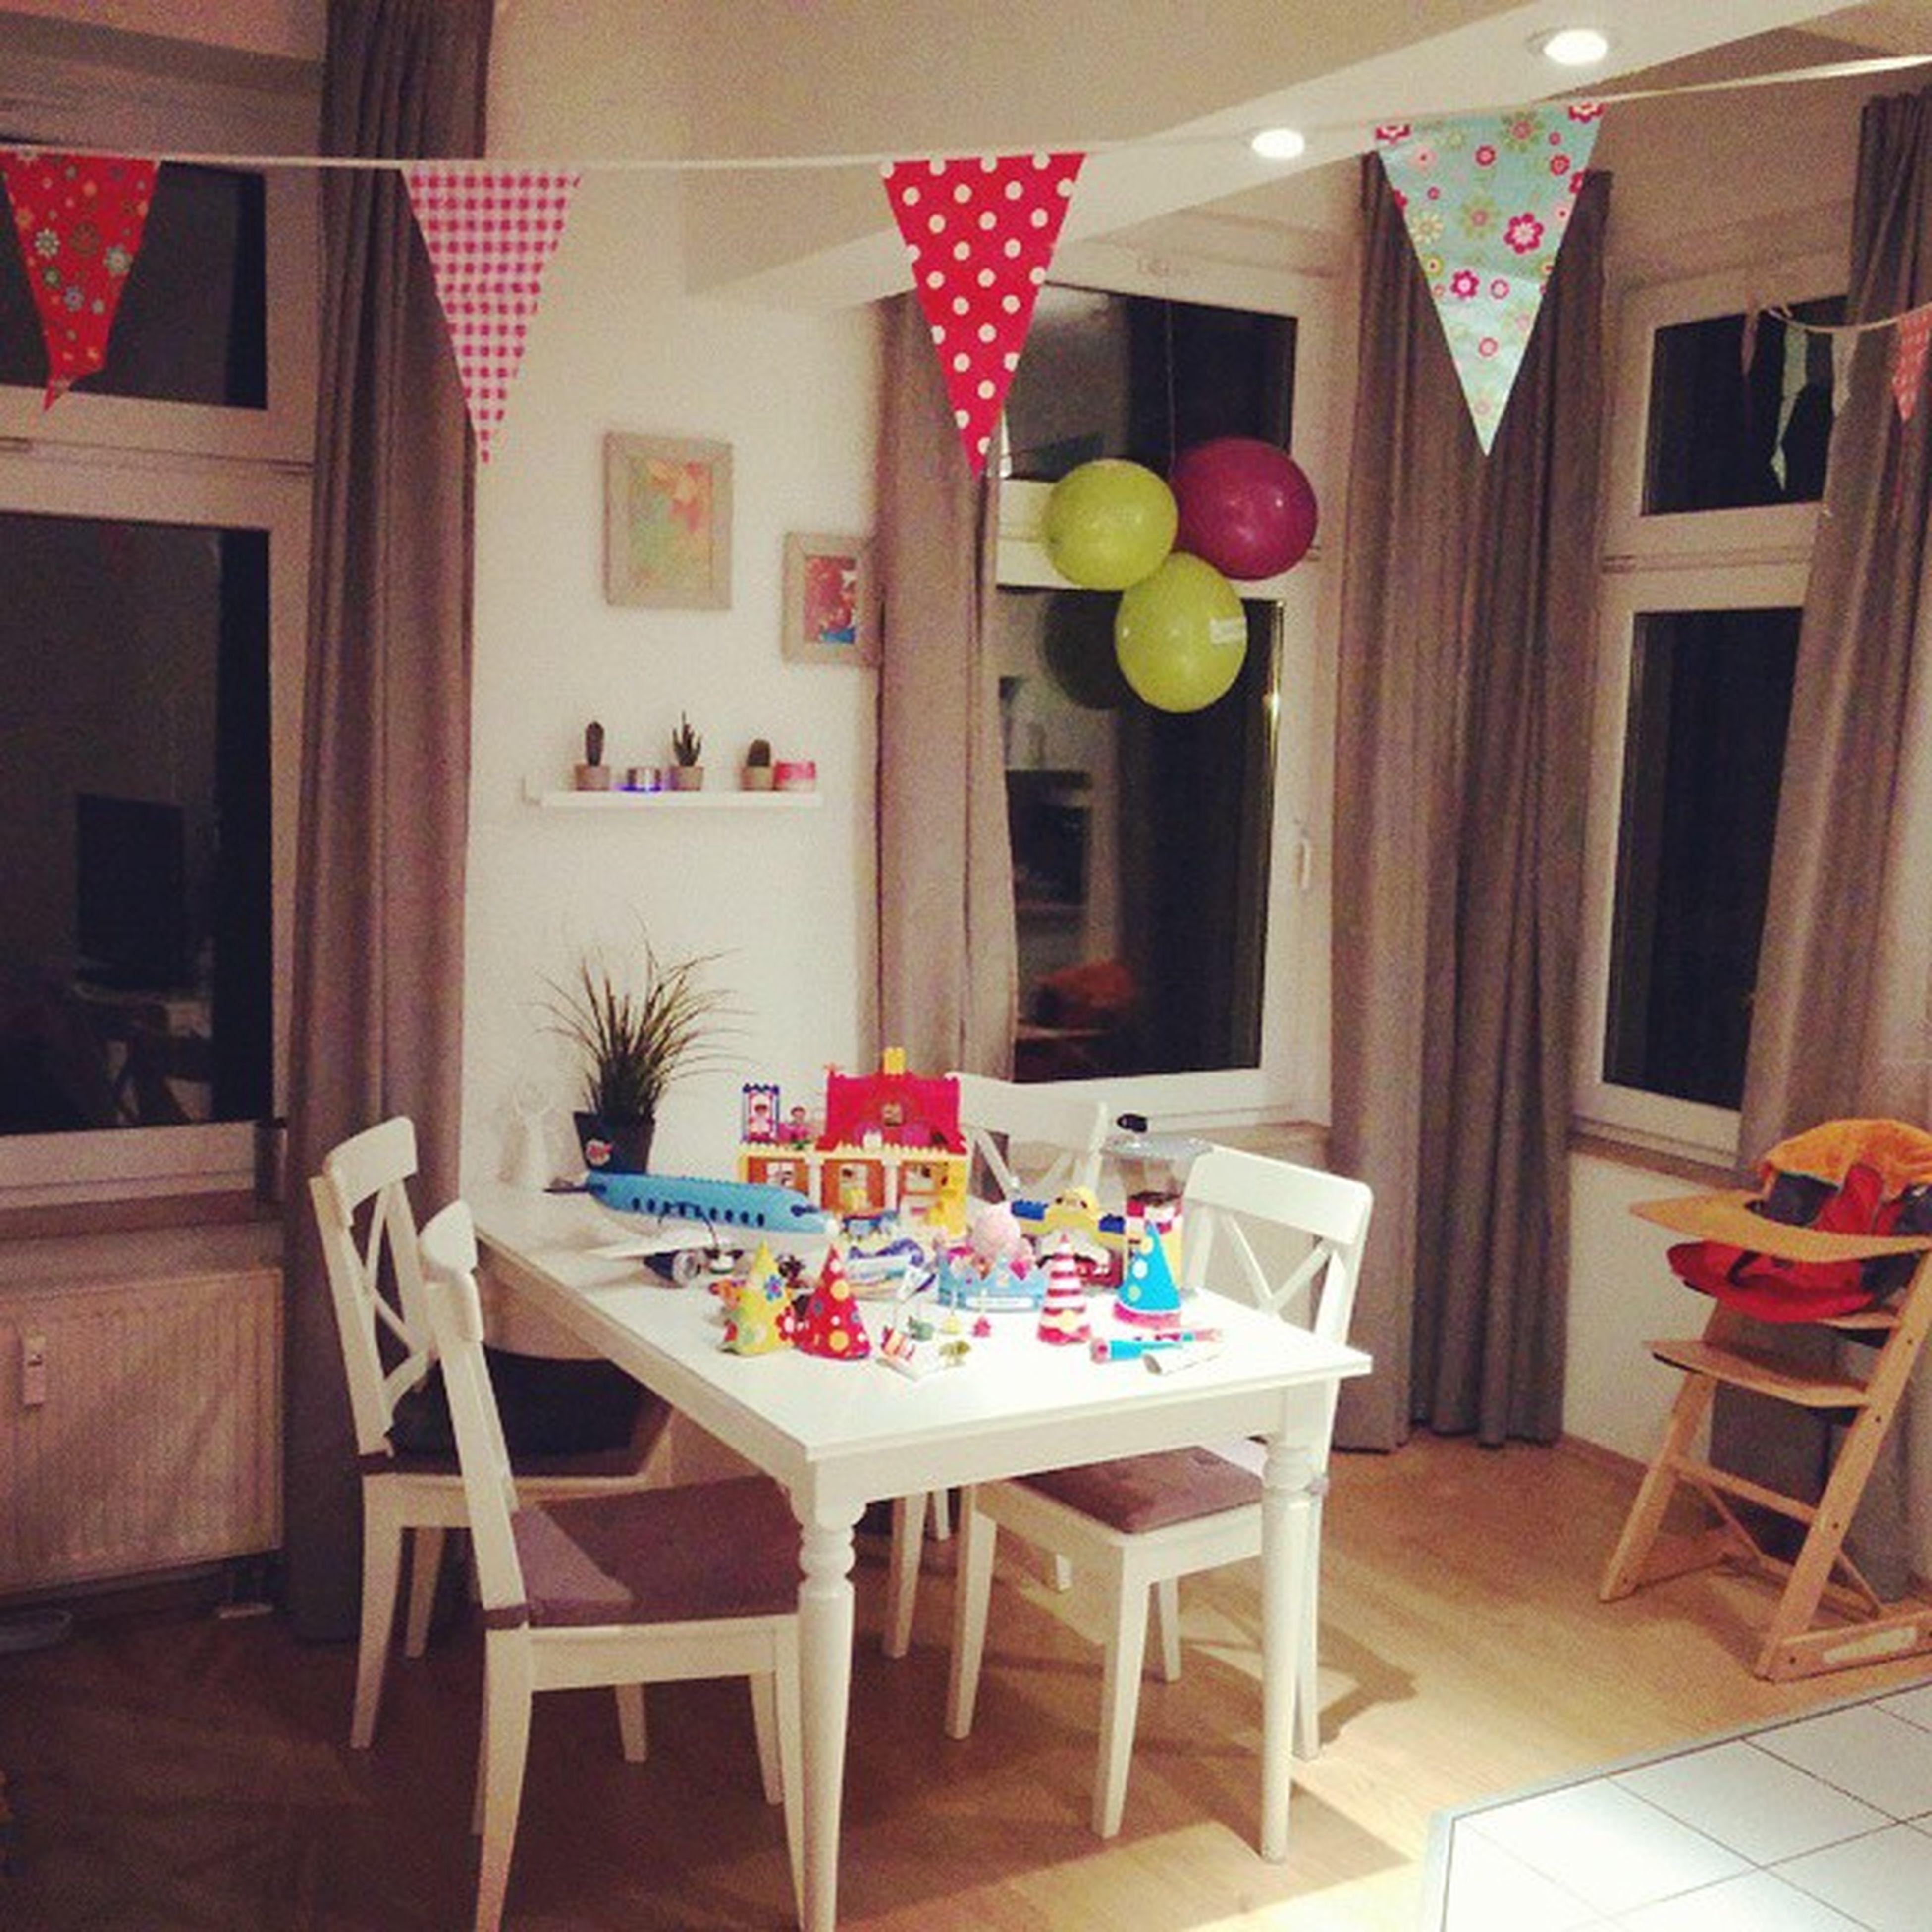 Second Birthday . Ourprideandjoy Ourlittlefamily Ourlittleboy littlebigadventure soproudofyou happybirthday happytimesahead happytimes birthdayparty excited